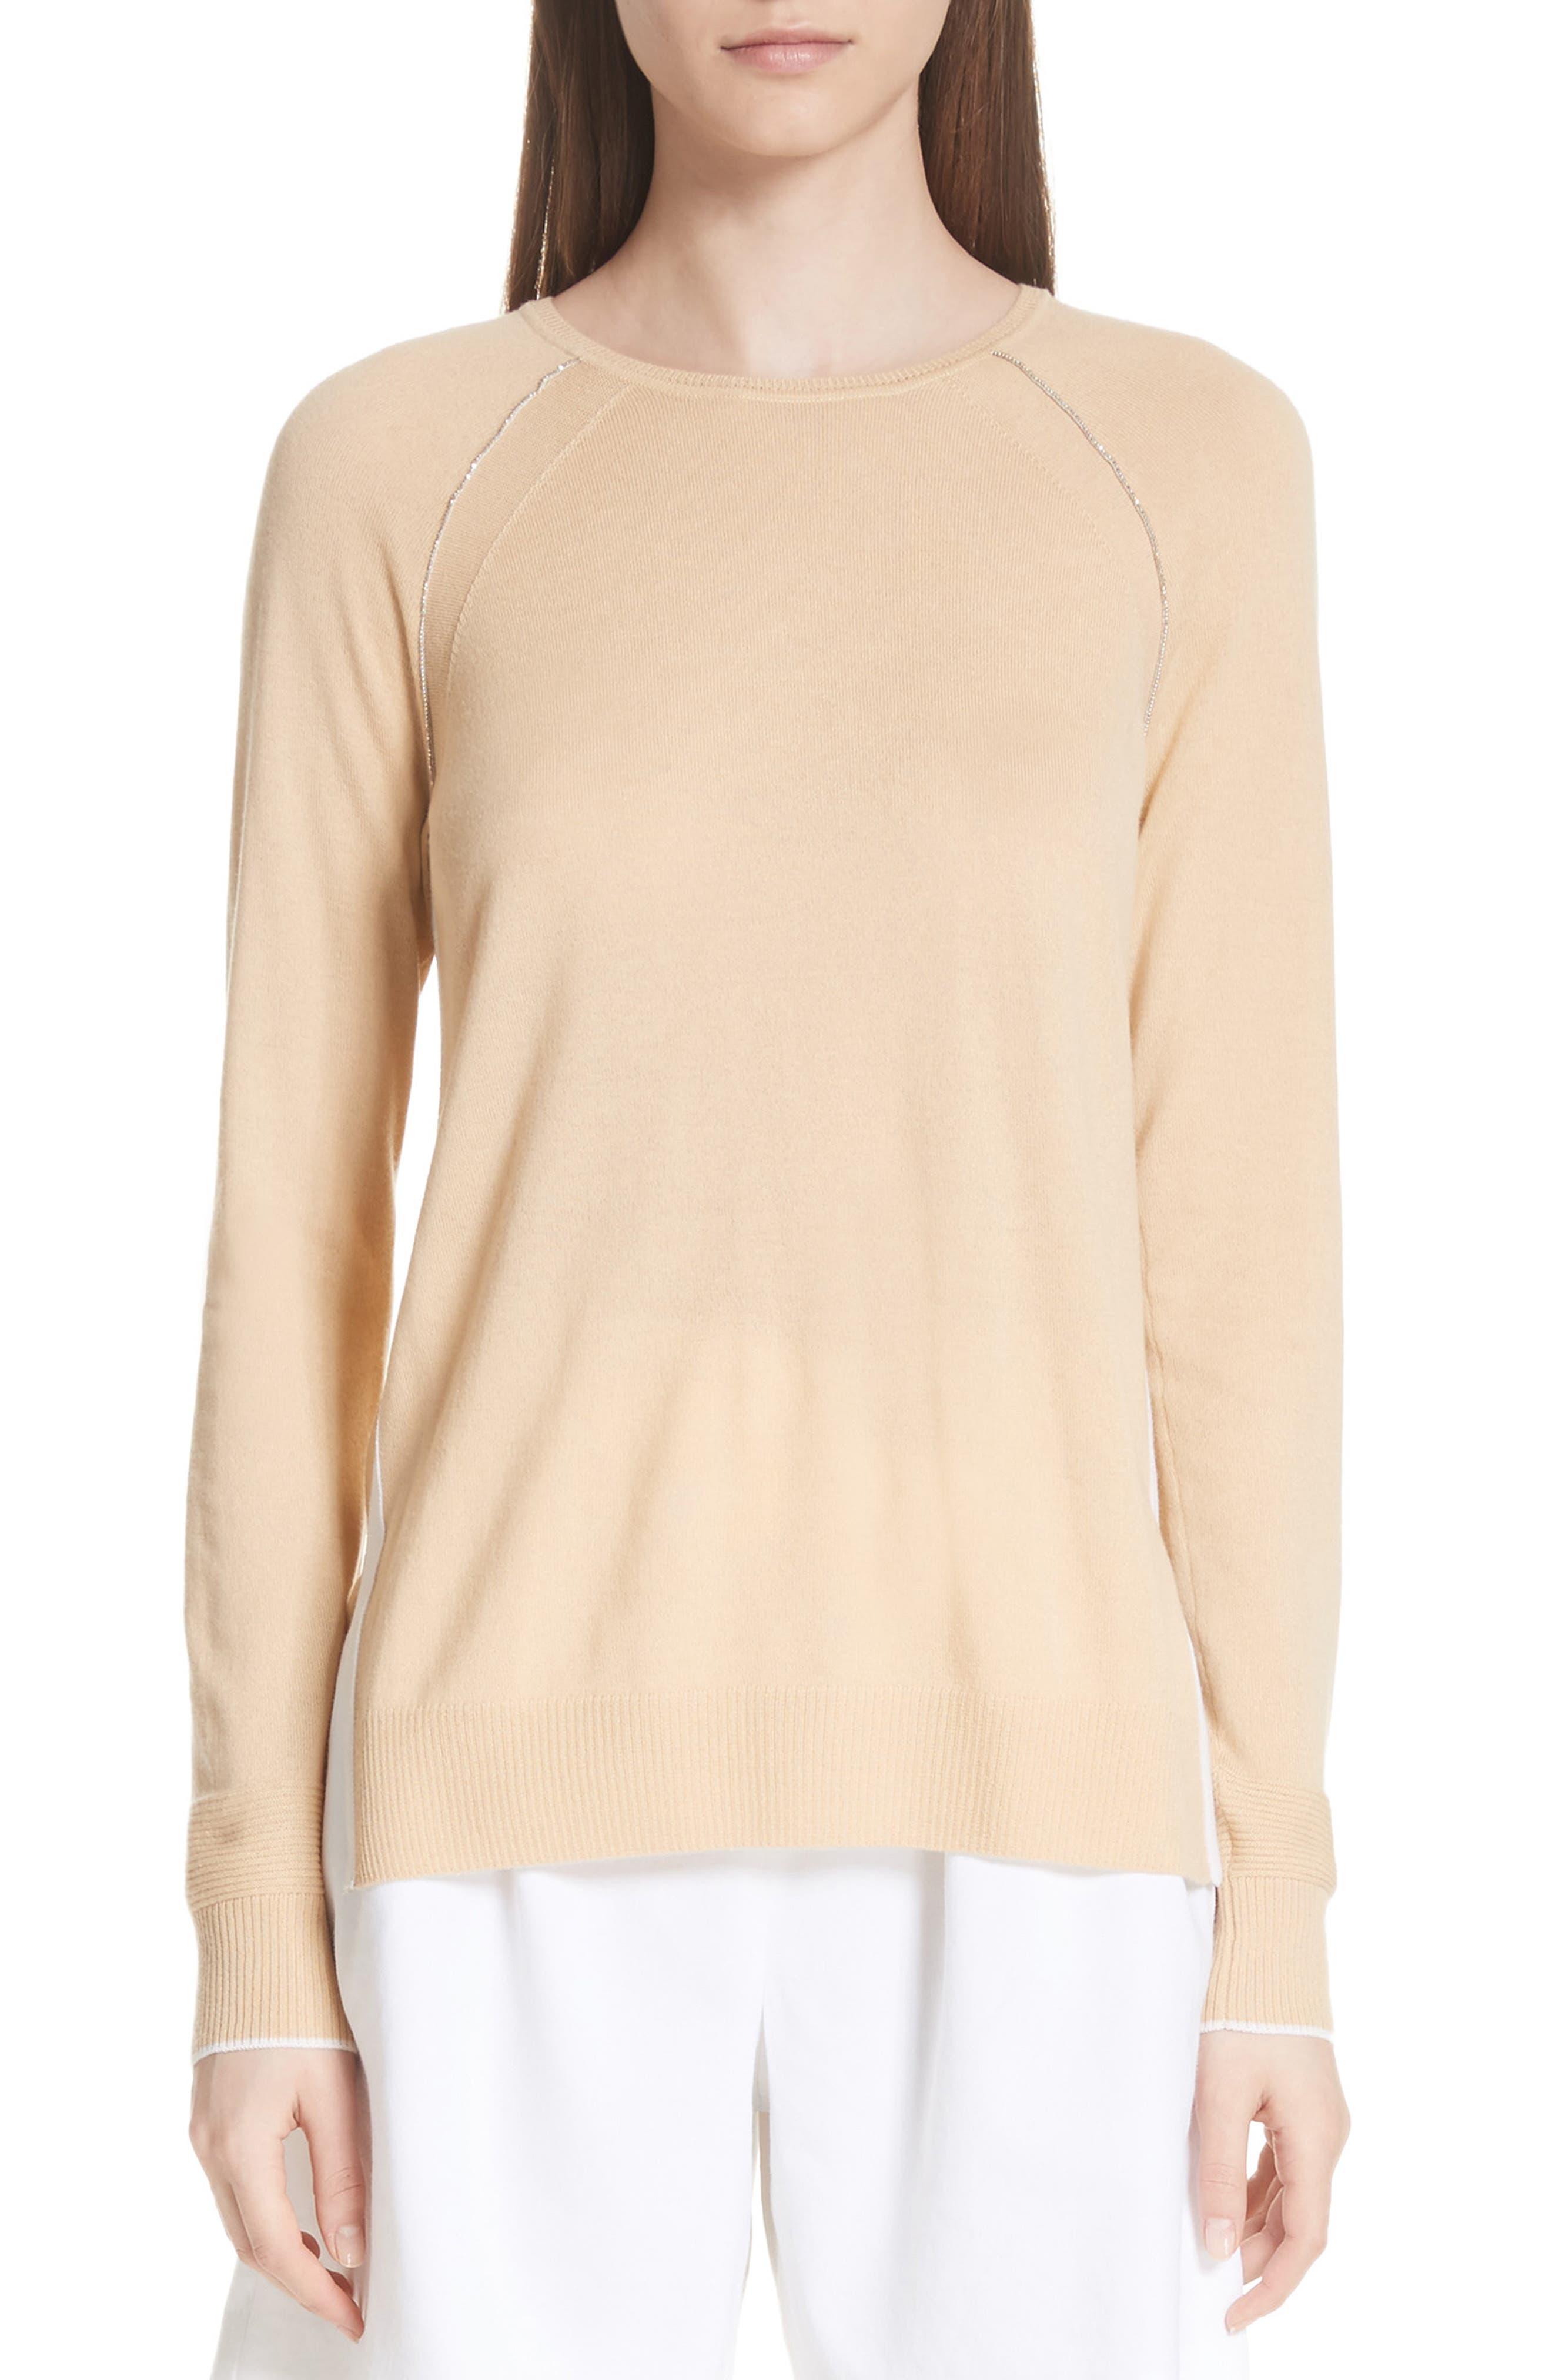 St. John Collection Raglan Sleeve Cashmere Sweater, Beige